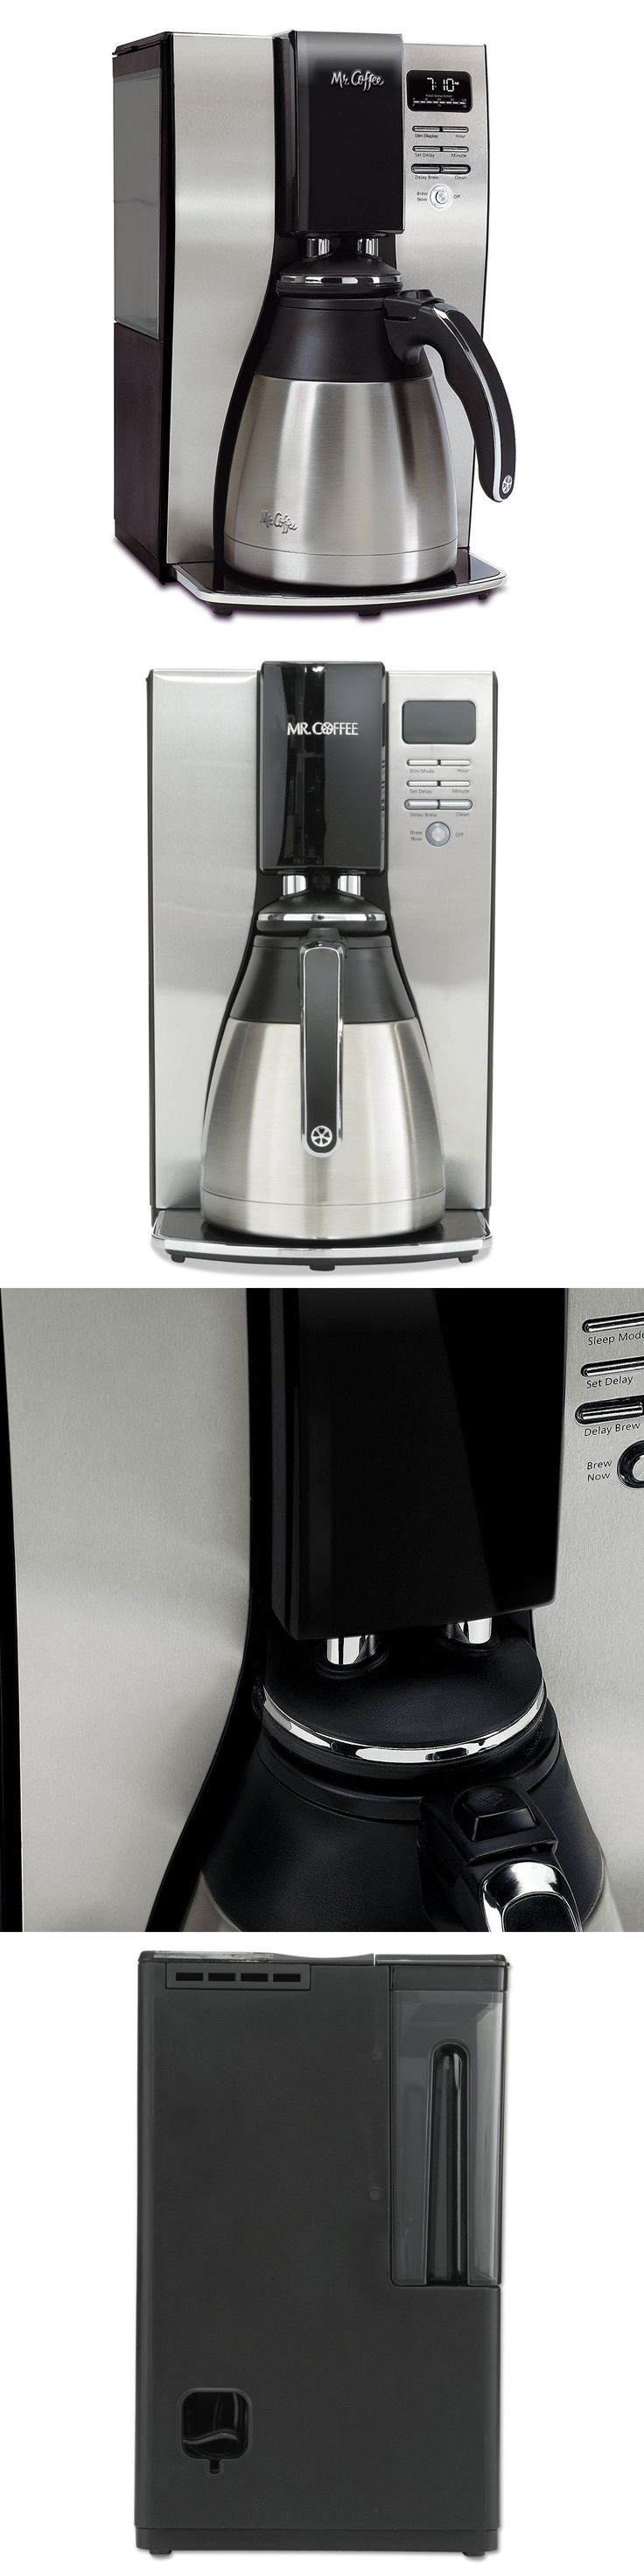 best 25 small kitchen appliances ideas on pinterest kitchen small kitchen appliances mr coffee 10 cup coffeemaker stainless steel